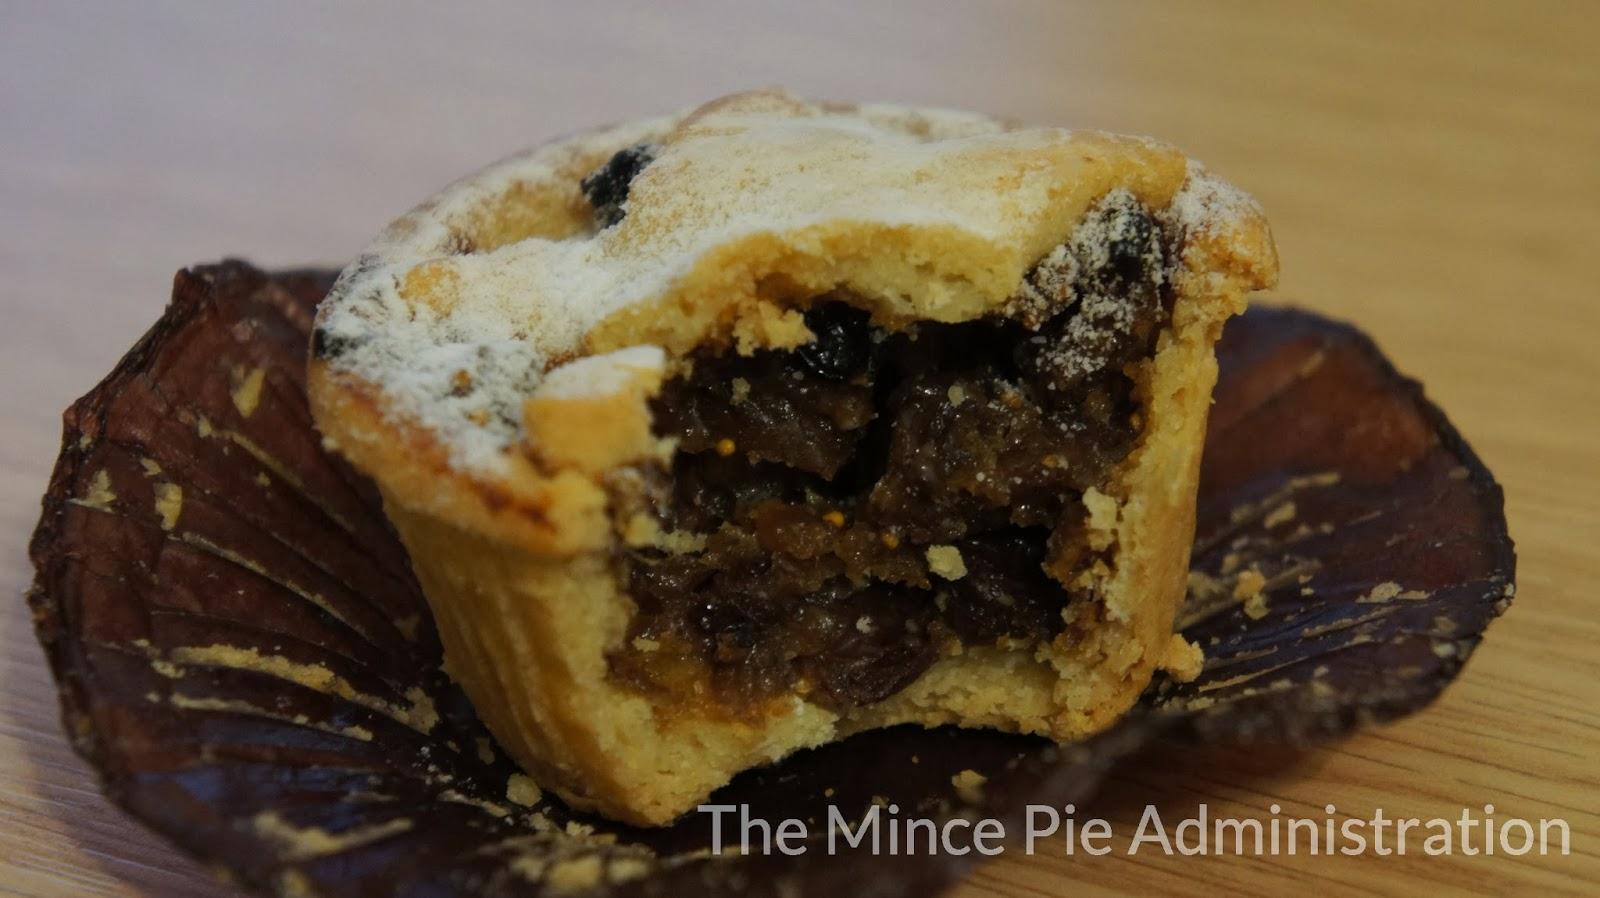 The Mince Pie Administration: Pret A Manger - Mince Pie